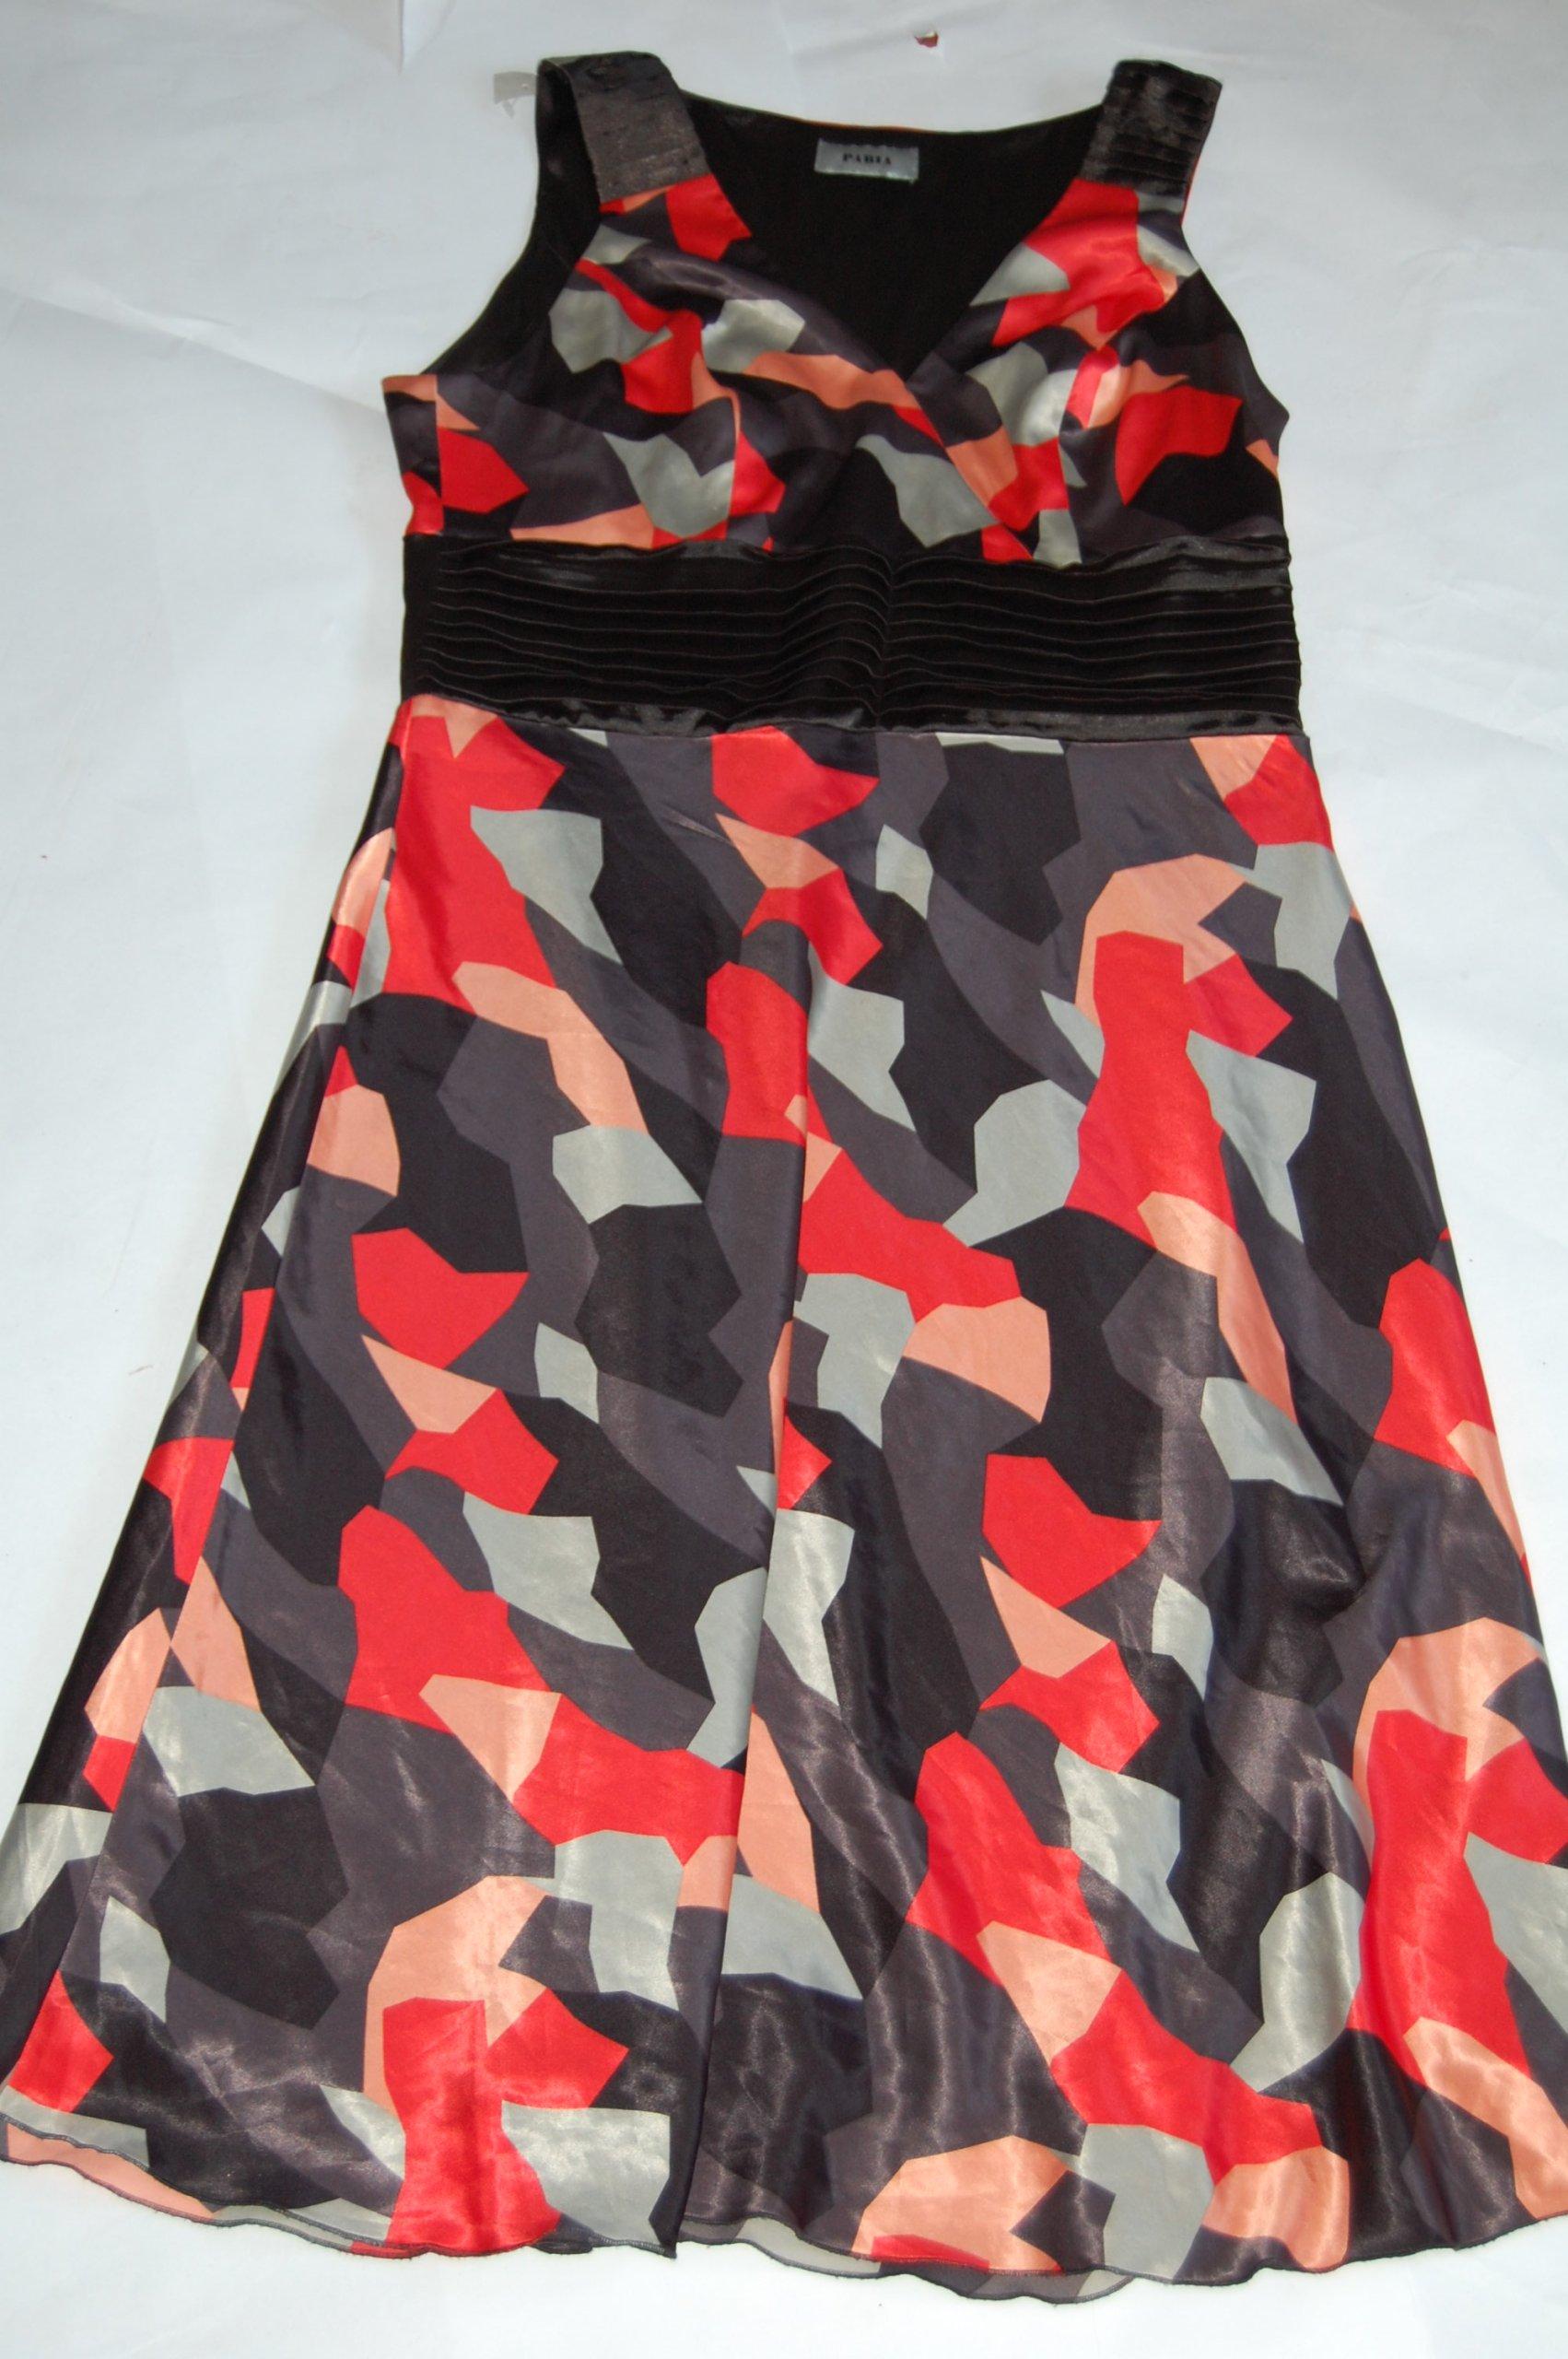 e61eb36b02 PABIA~~44-46~~sukienka WESELE - 7418441931 - oficjalne archiwum allegro